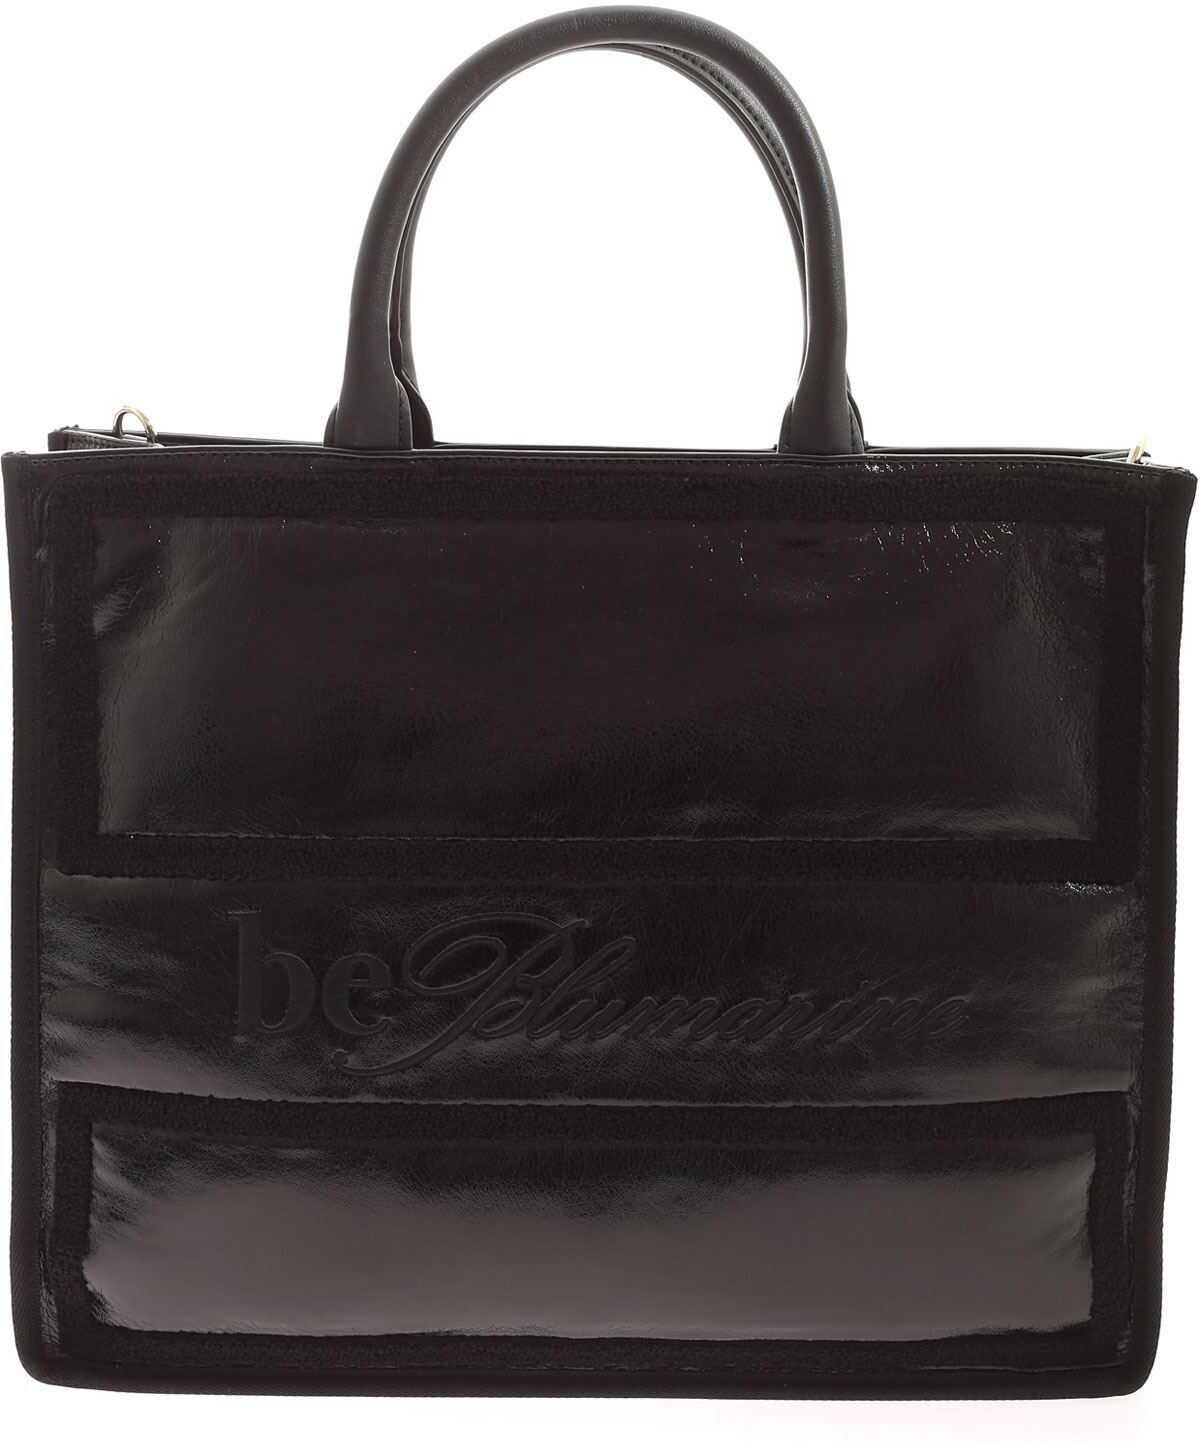 Be Blumarine Tone-On-Tone Details Shopper Bag In Black E17ZBBN1 71704 MI8 Black imagine b-mall.ro